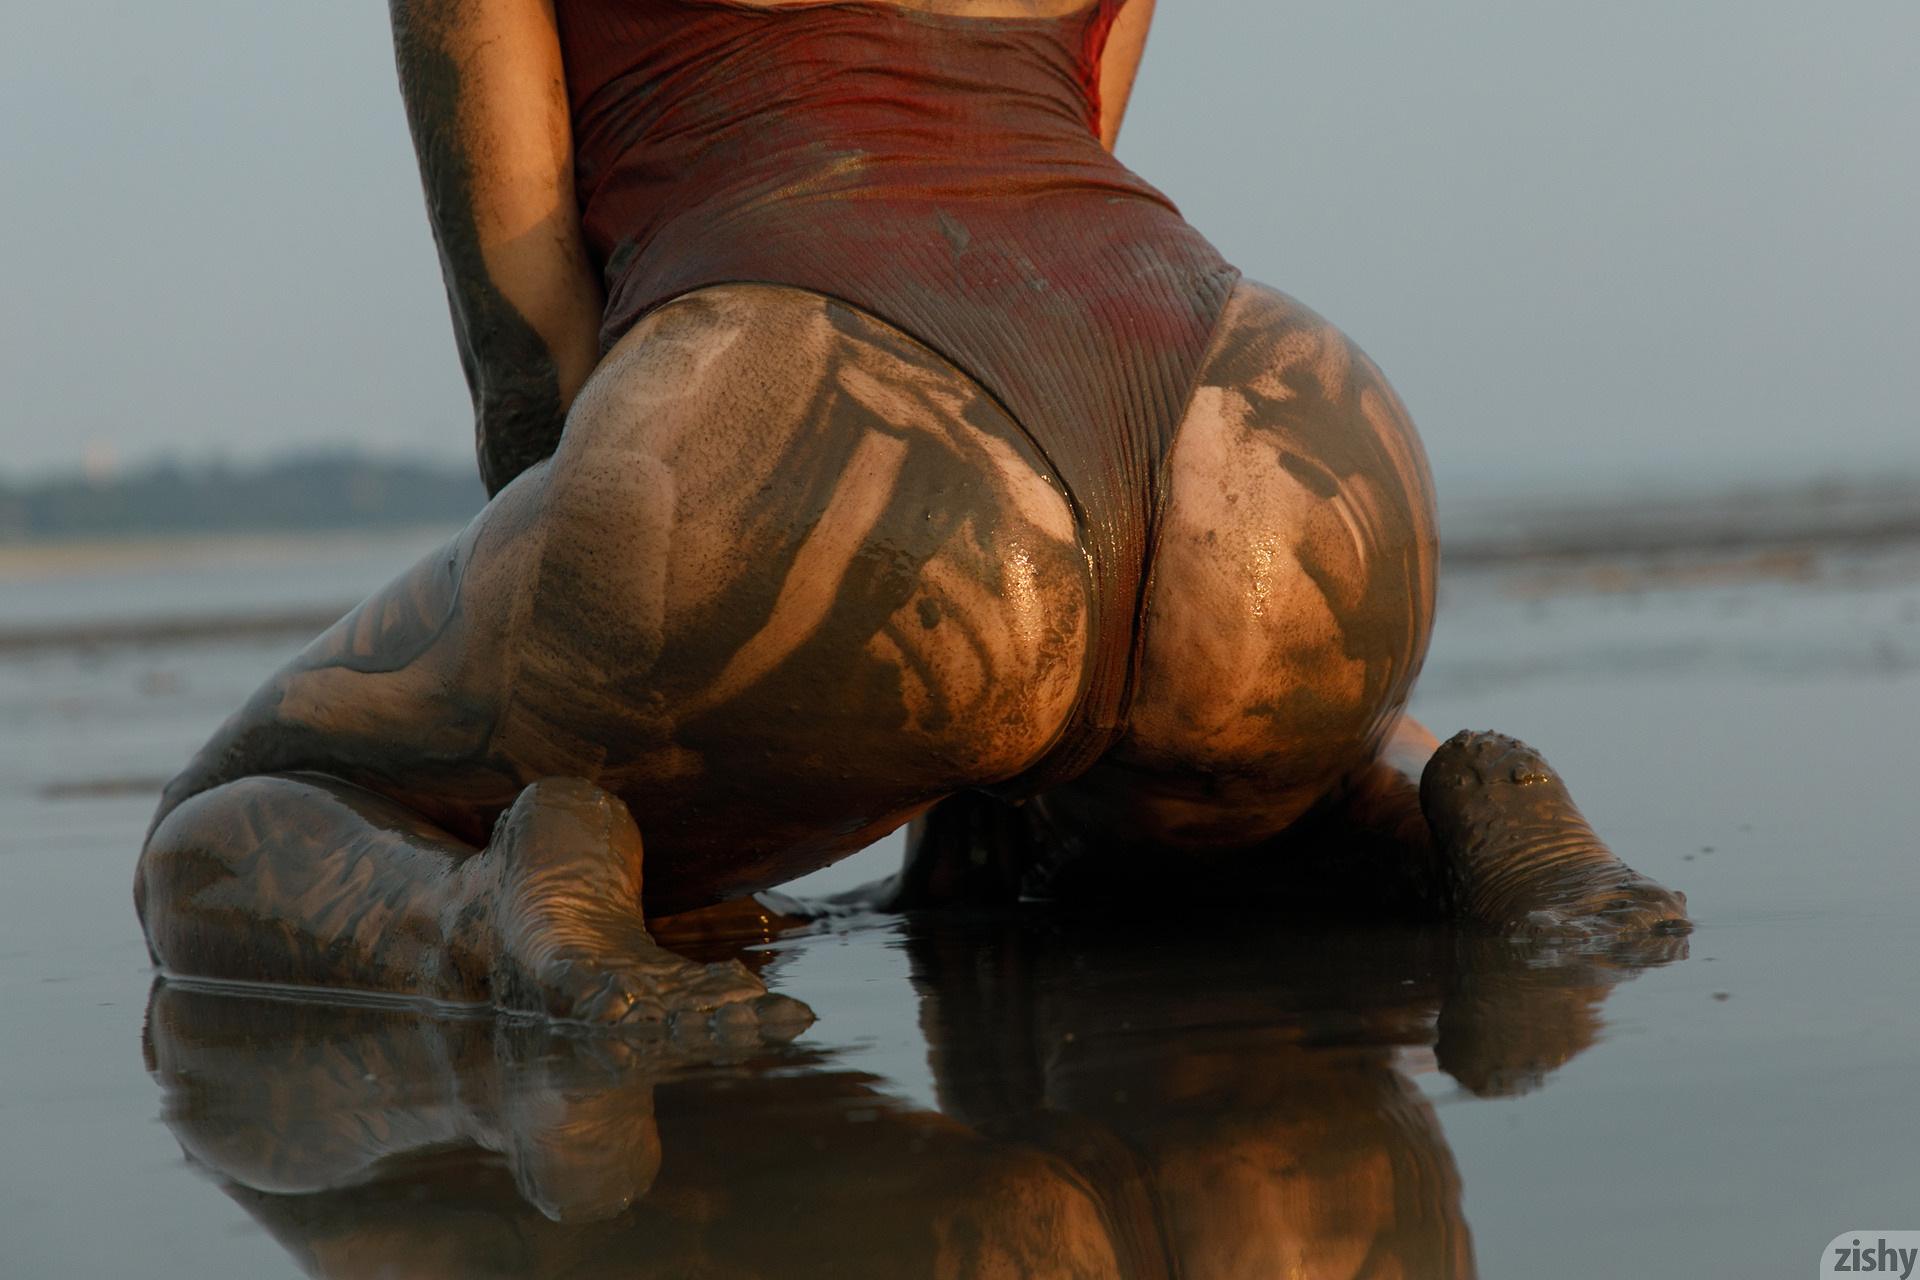 Sofia Orlova On Gryaznyy Beach Zishy (41)